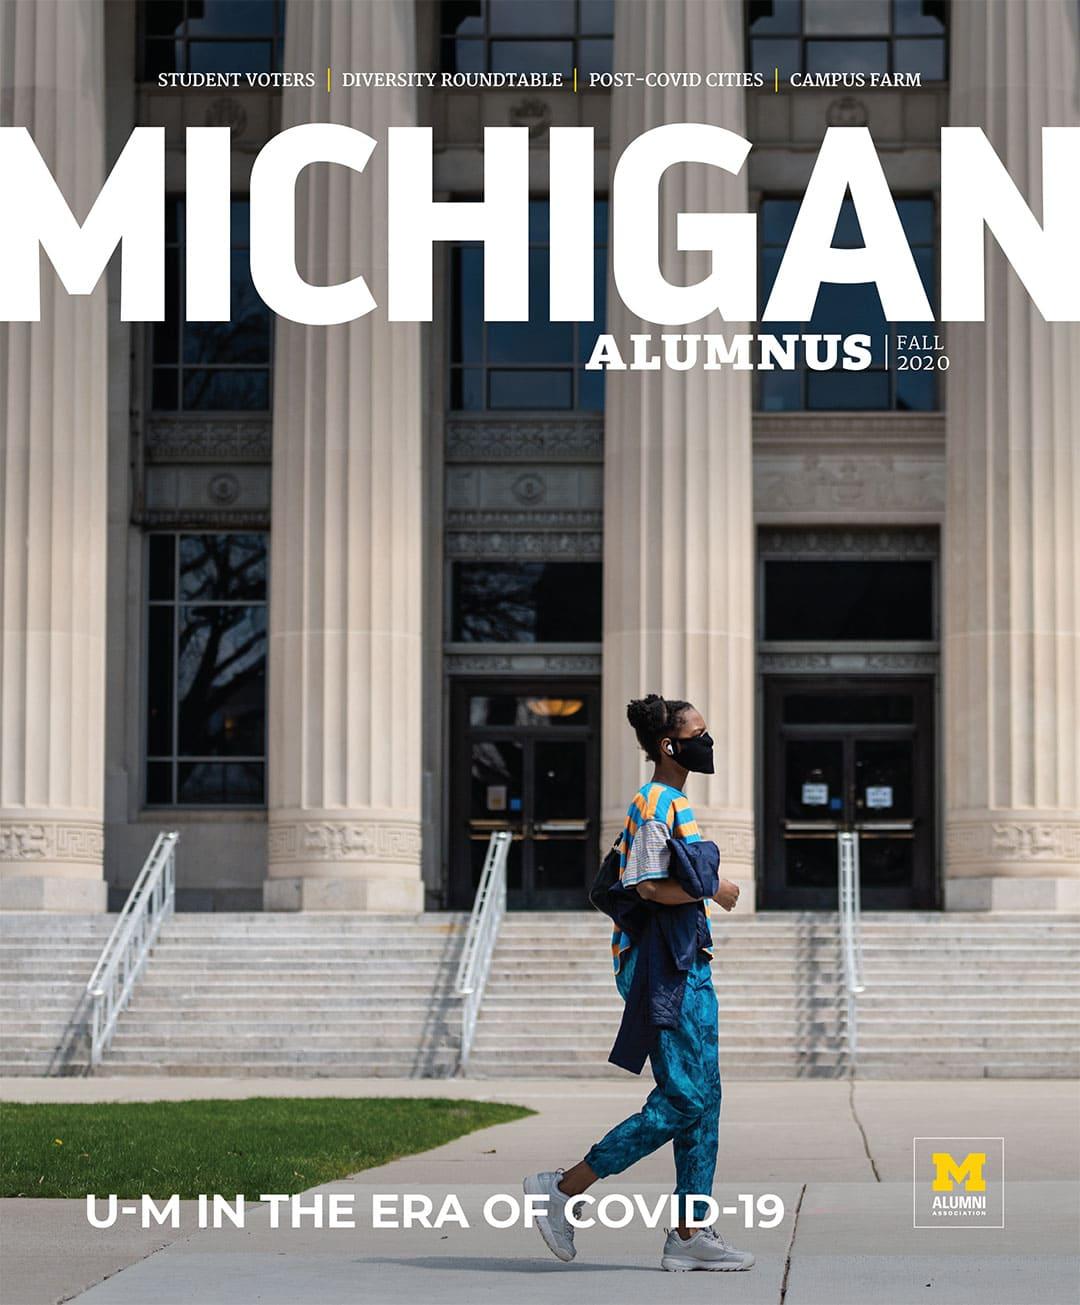 Michigan Alumnus Fall 2020